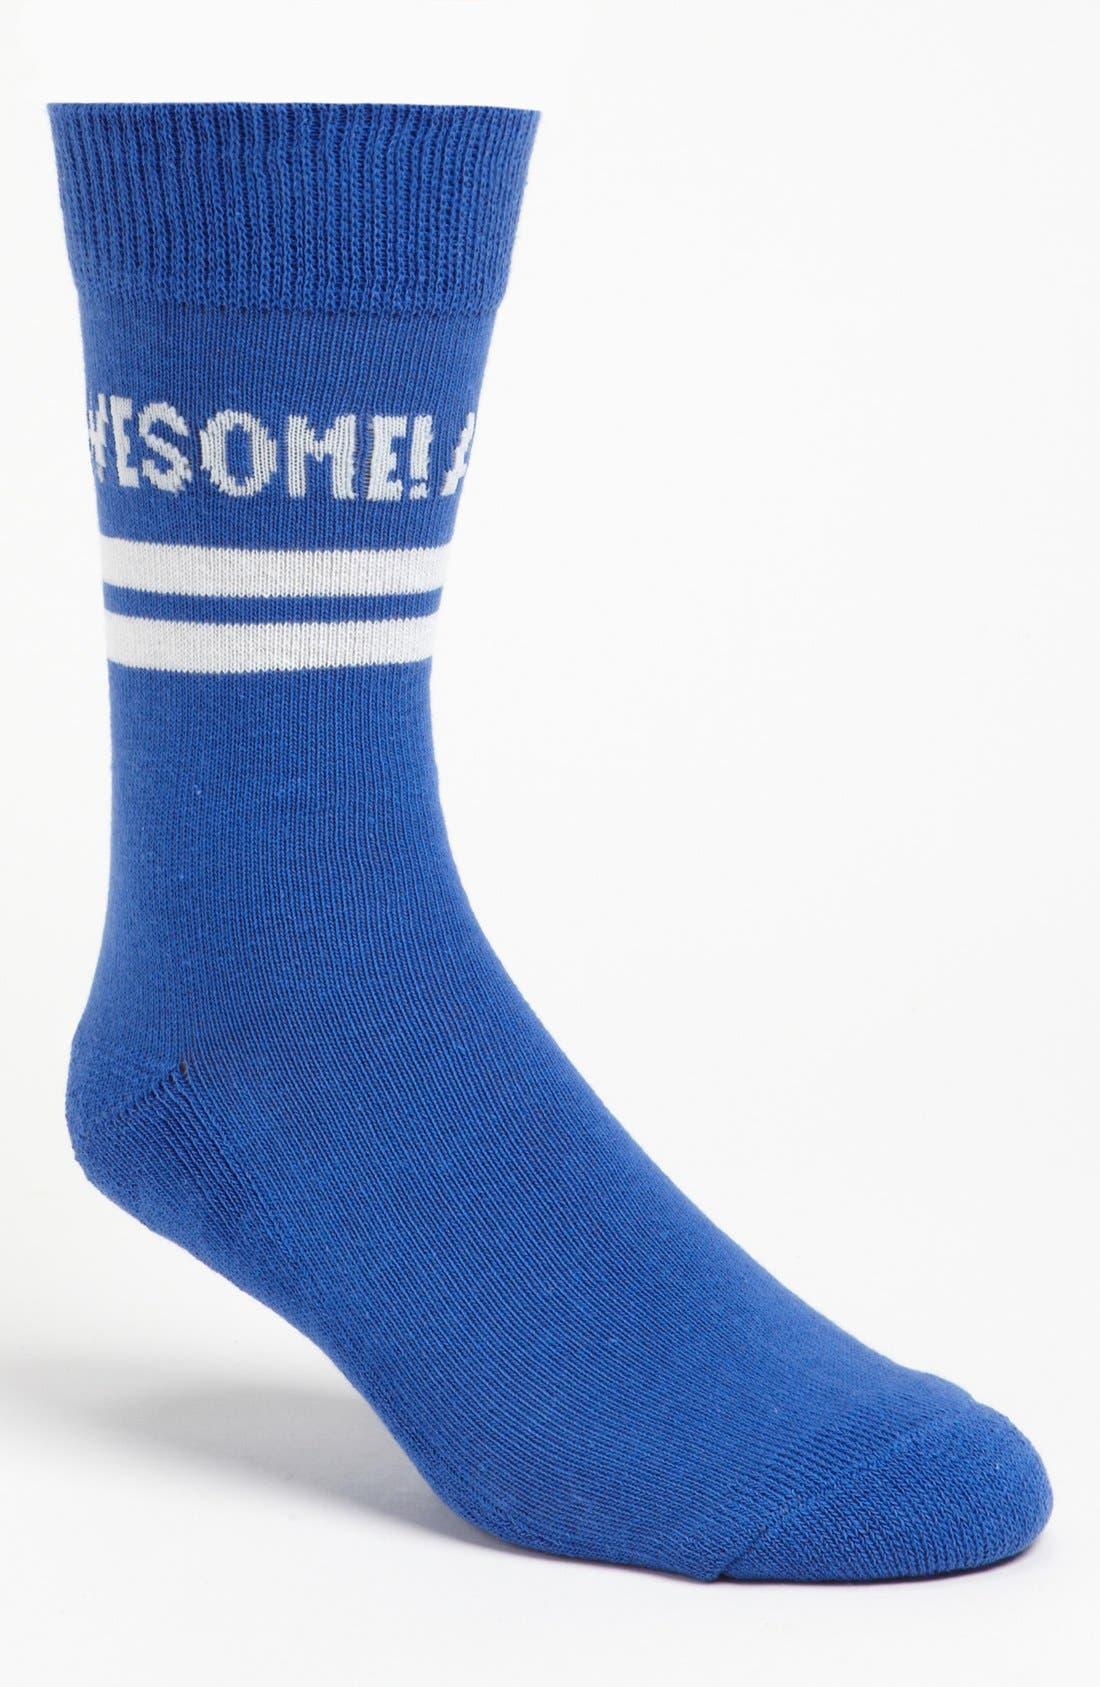 Main Image - Topman 'Awesome' Crew Socks